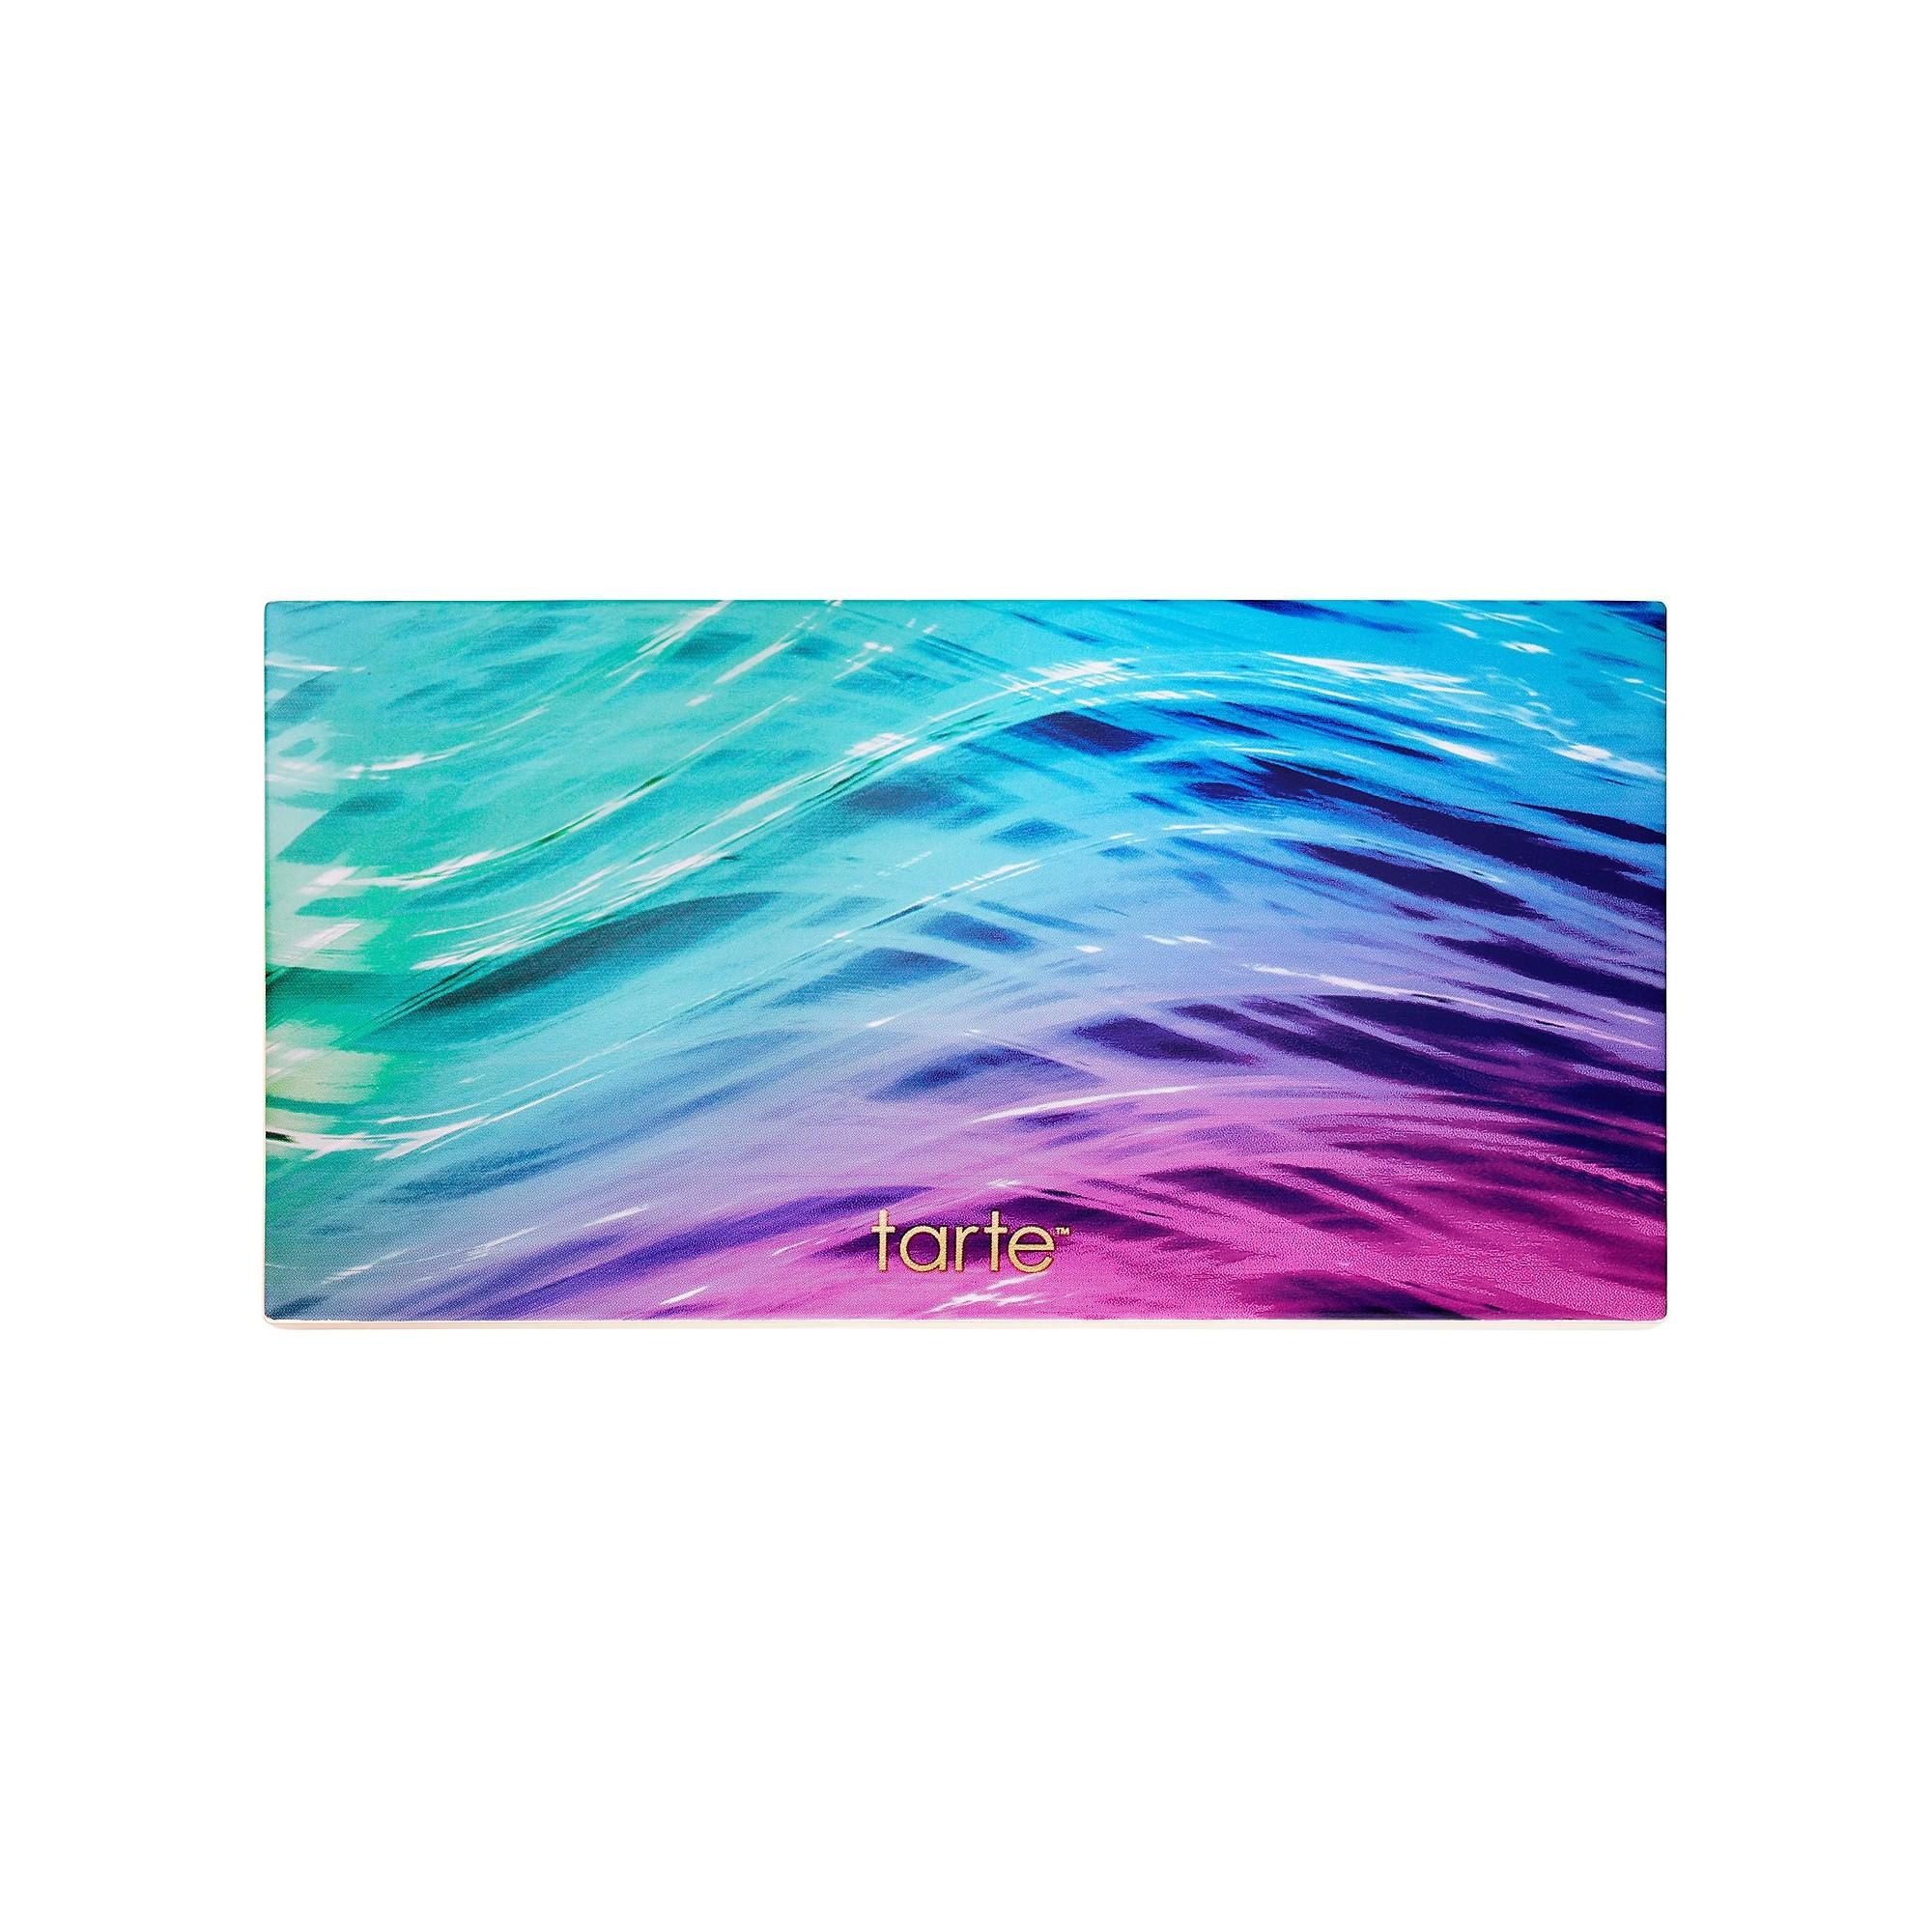 tarte rainforest of the sea skin twinkle lighting palette review